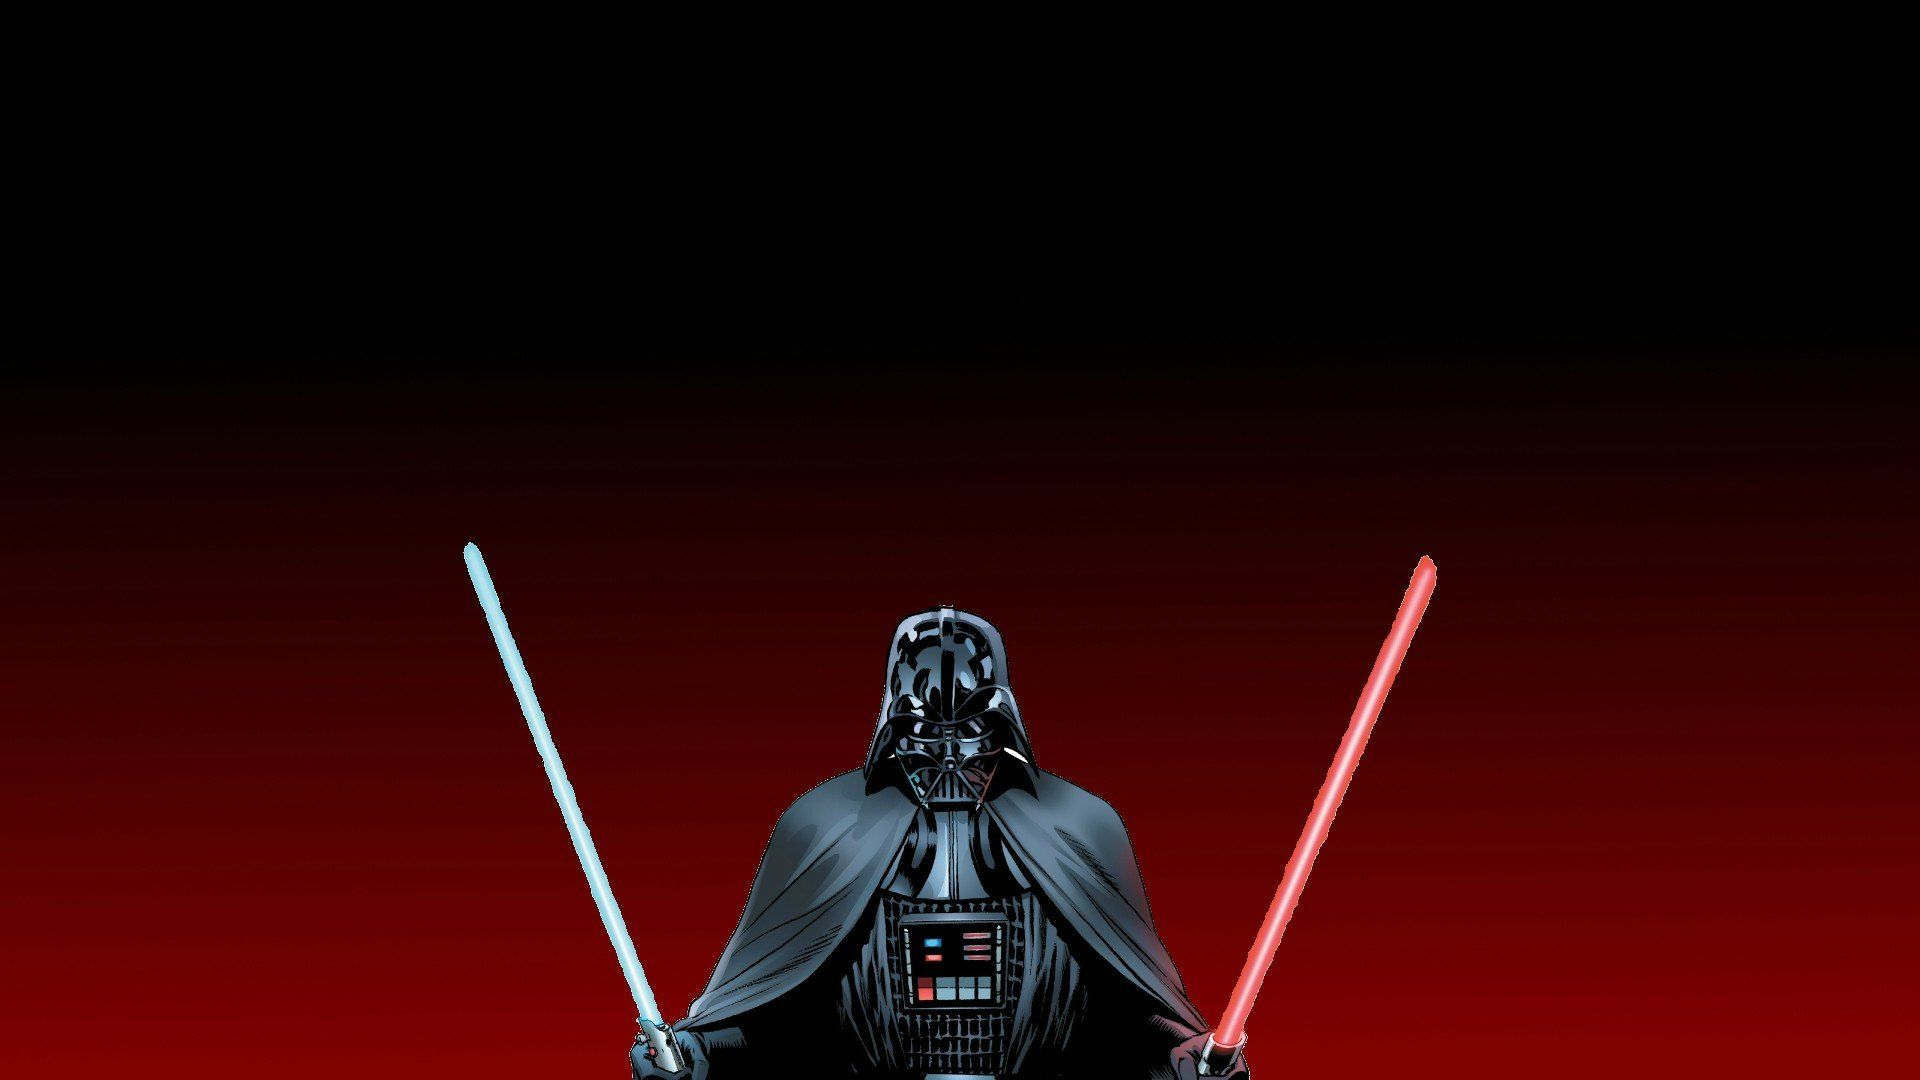 Star Wars Screensaver laptop wallpaper